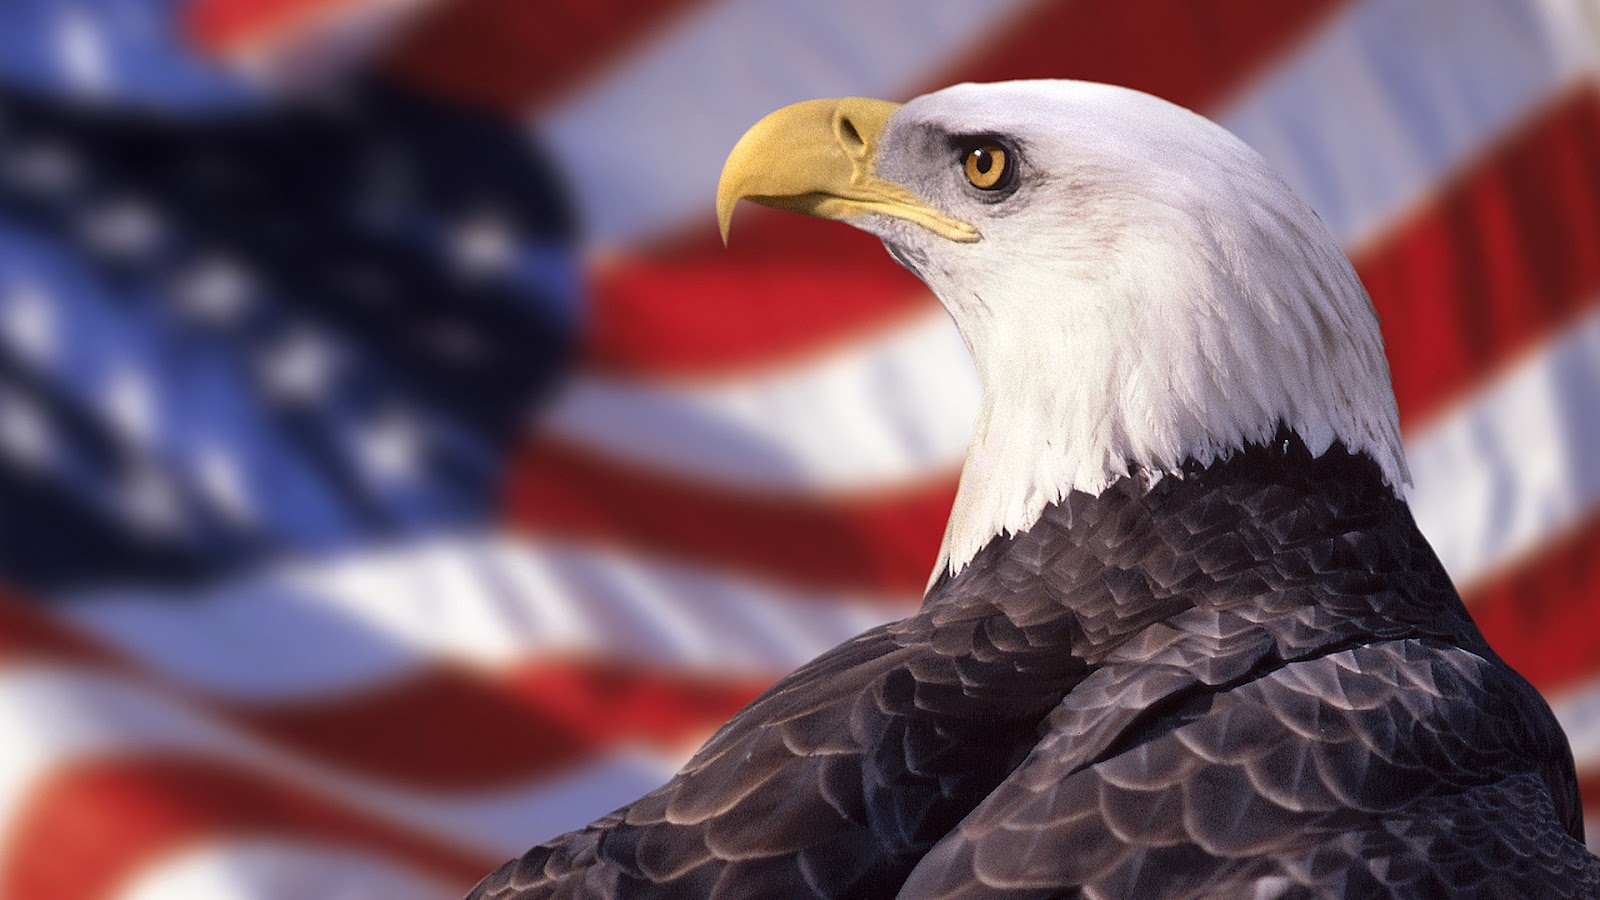 http://3.bp.blogspot.com/-8AL8vkJMEro/T_Q2eK-9-9I/AAAAAAAADzg/PClFTNHmIZk/s1600/Bald+eagle+wallpapers+5.jpg